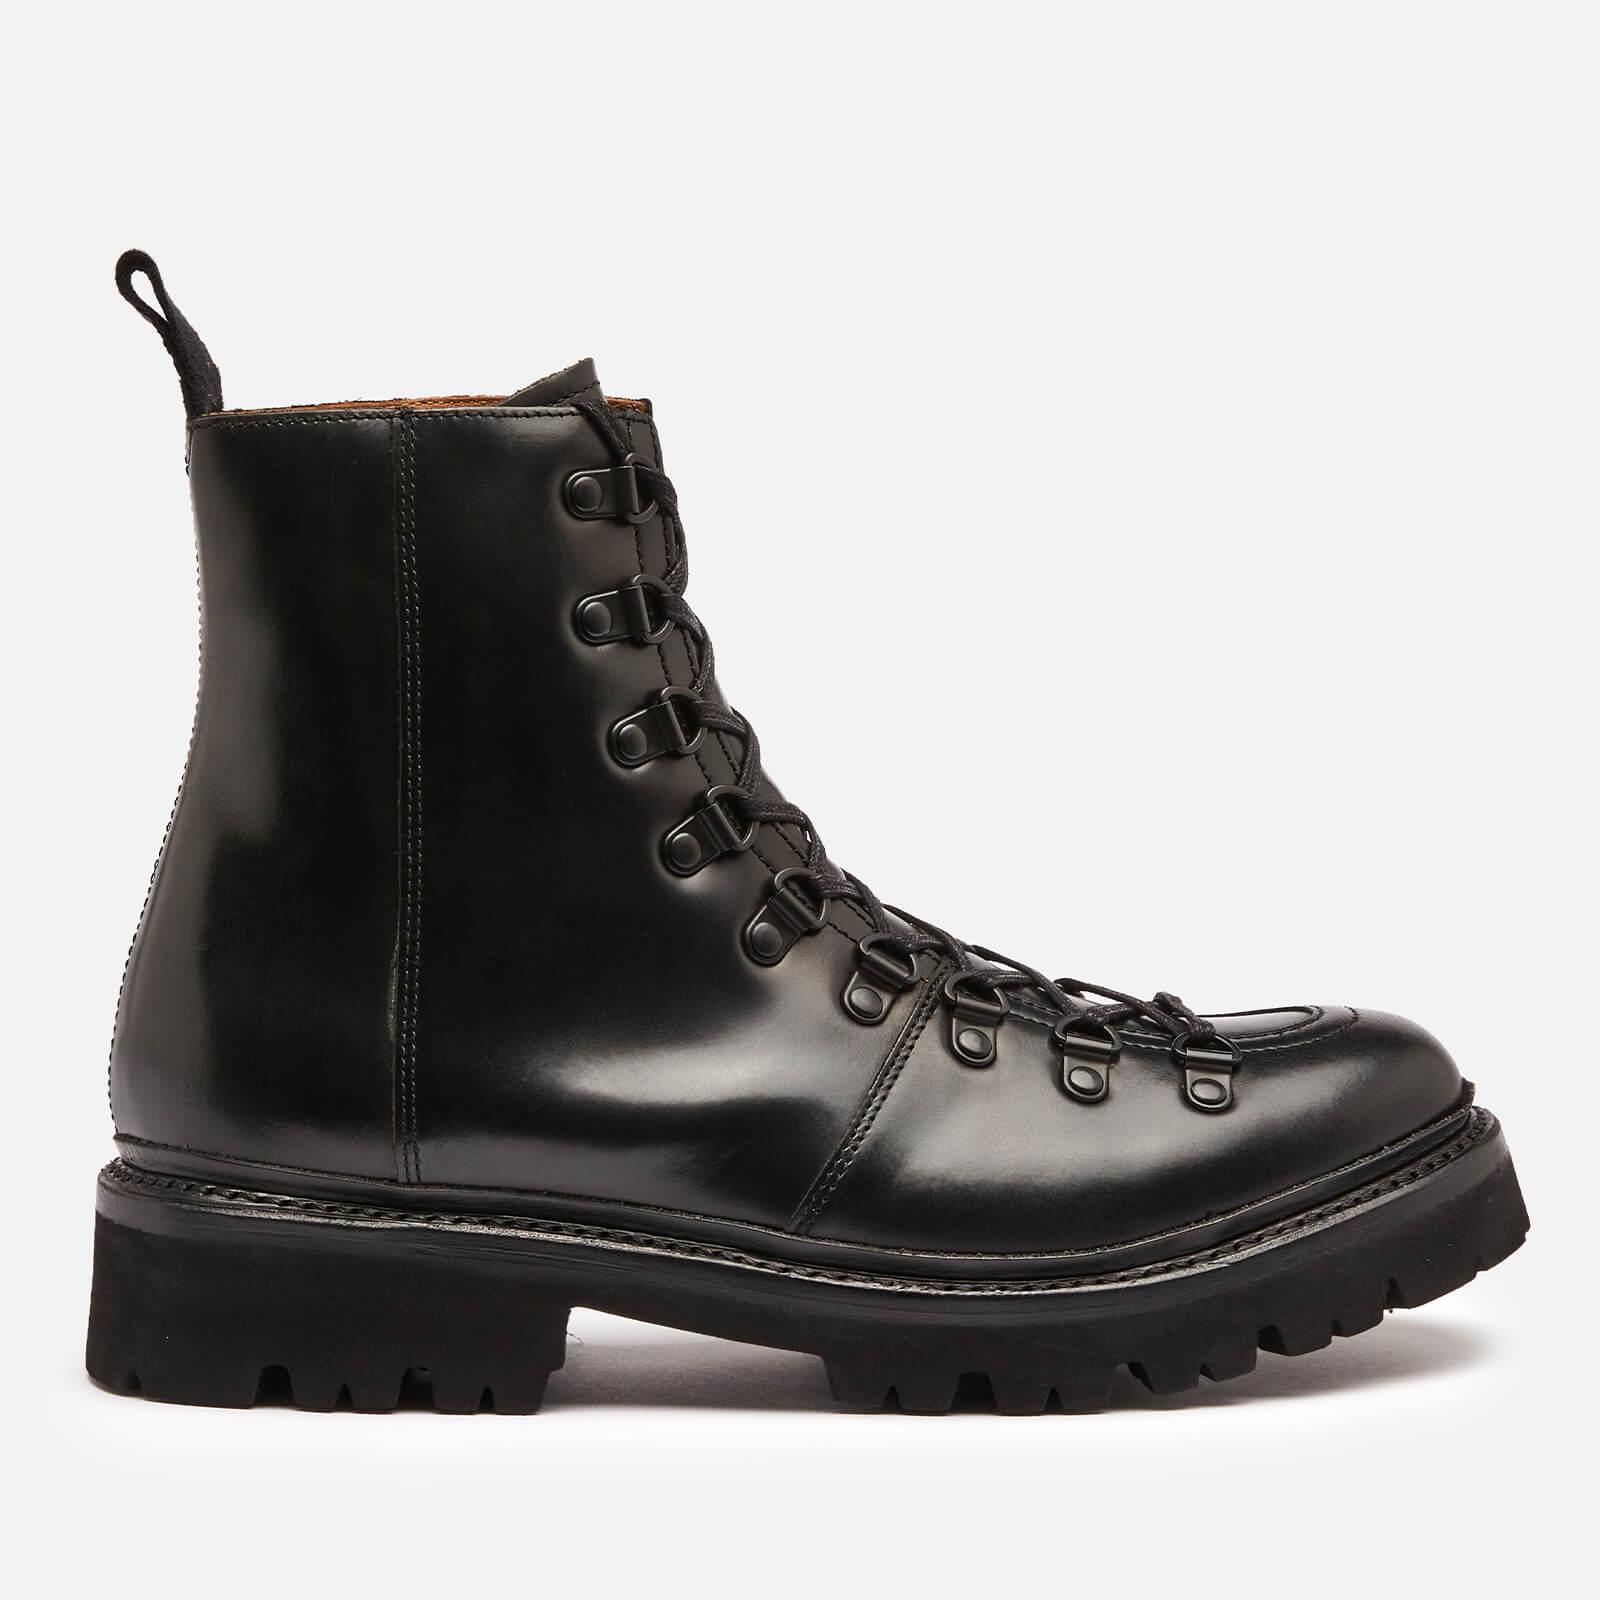 Grenson Women's Nanette Leather Hiking Style Boots - Black - Uk 3